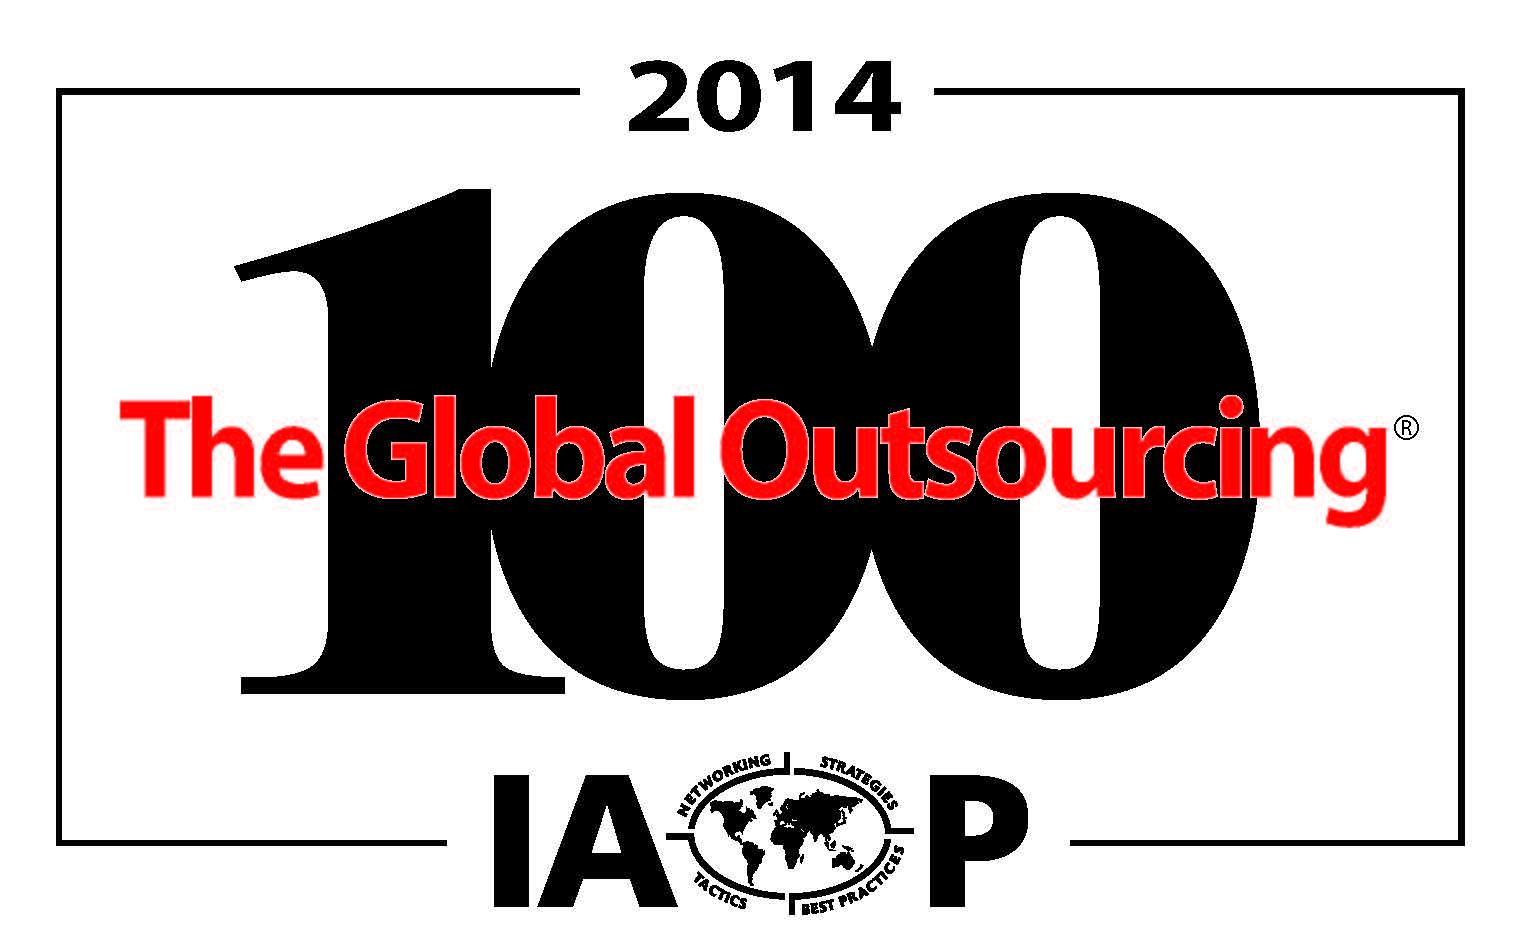 Iaop 2014 Global Outsourcing 100 Ranking